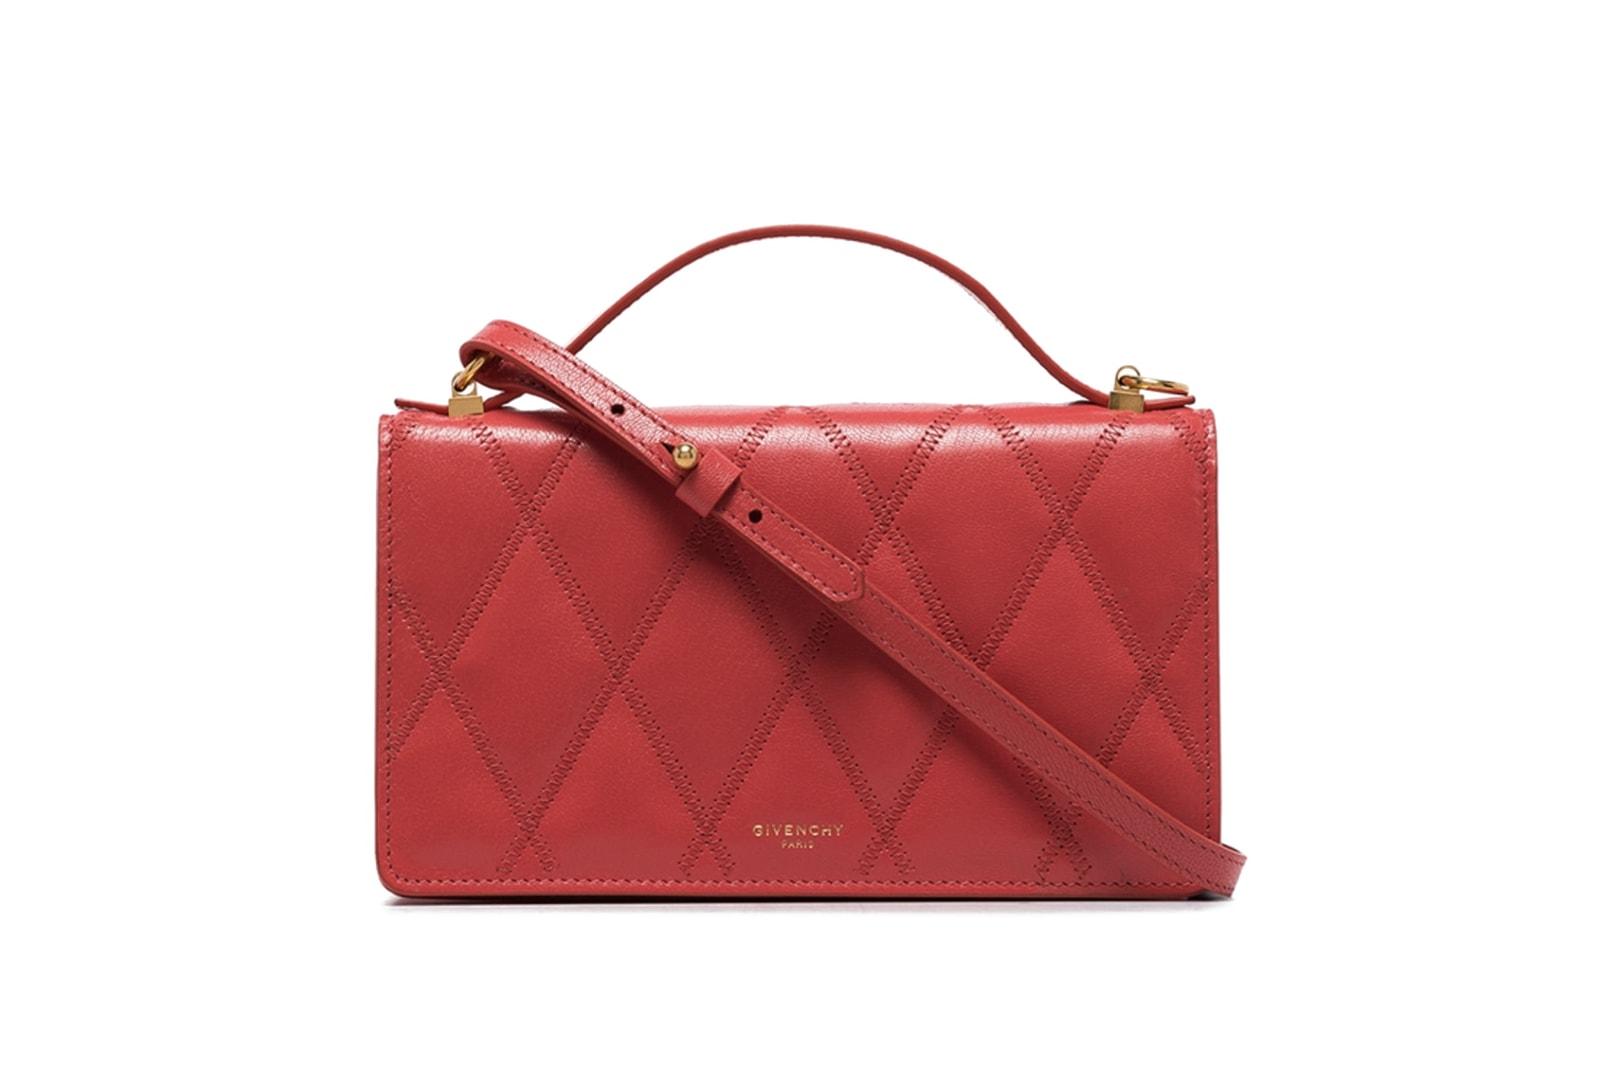 Quilted Bag Trend Bottega Veneta Burberry Balenciaga Accessories Designer Purse Fashion